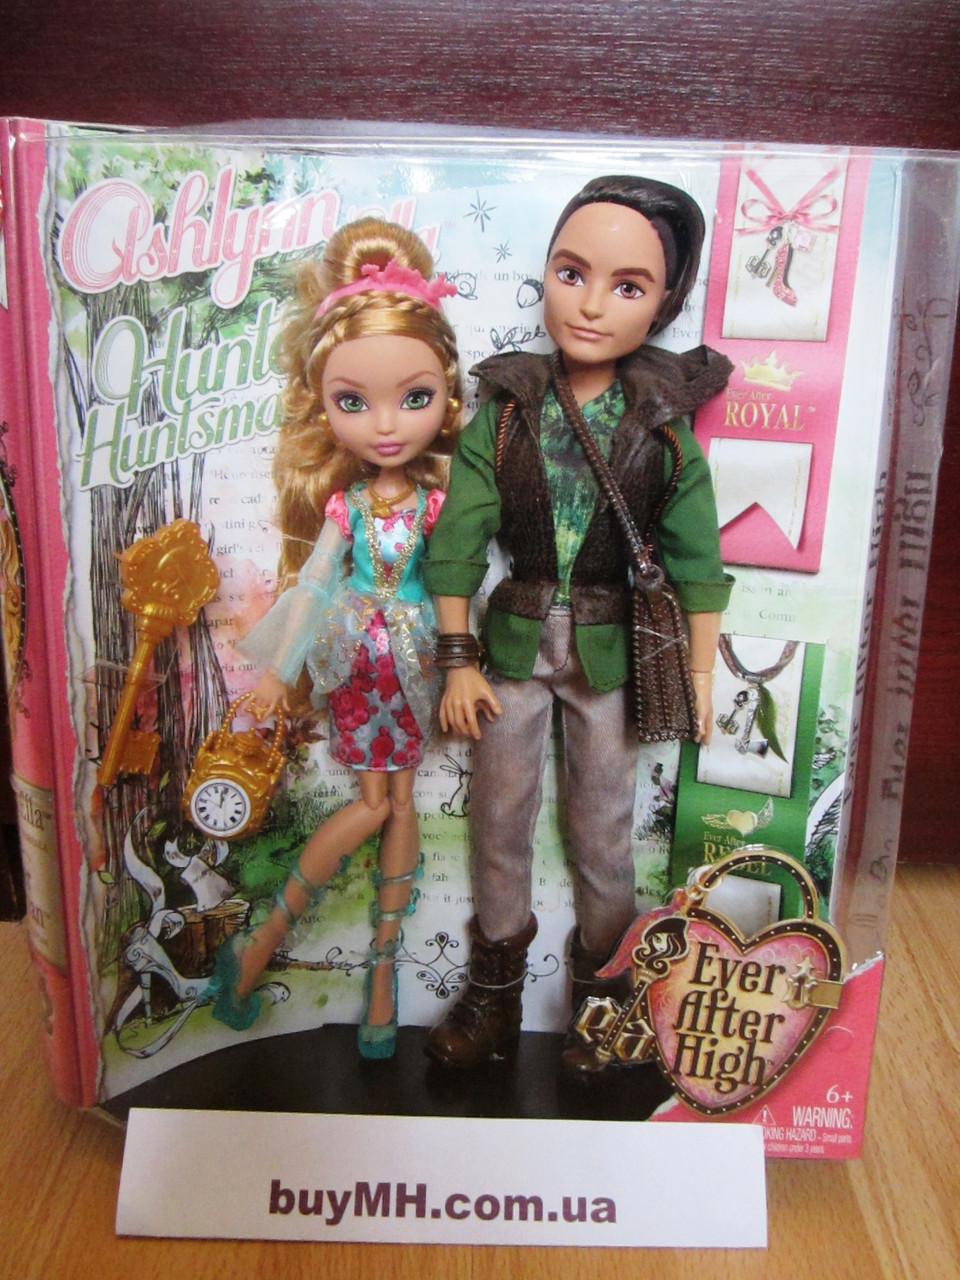 Куклы Ever After High Ashlynn Ella & Hunter Huntsman Doll, 2-Pack Эшлин Элла и Хантер Хантсмен, фото 1